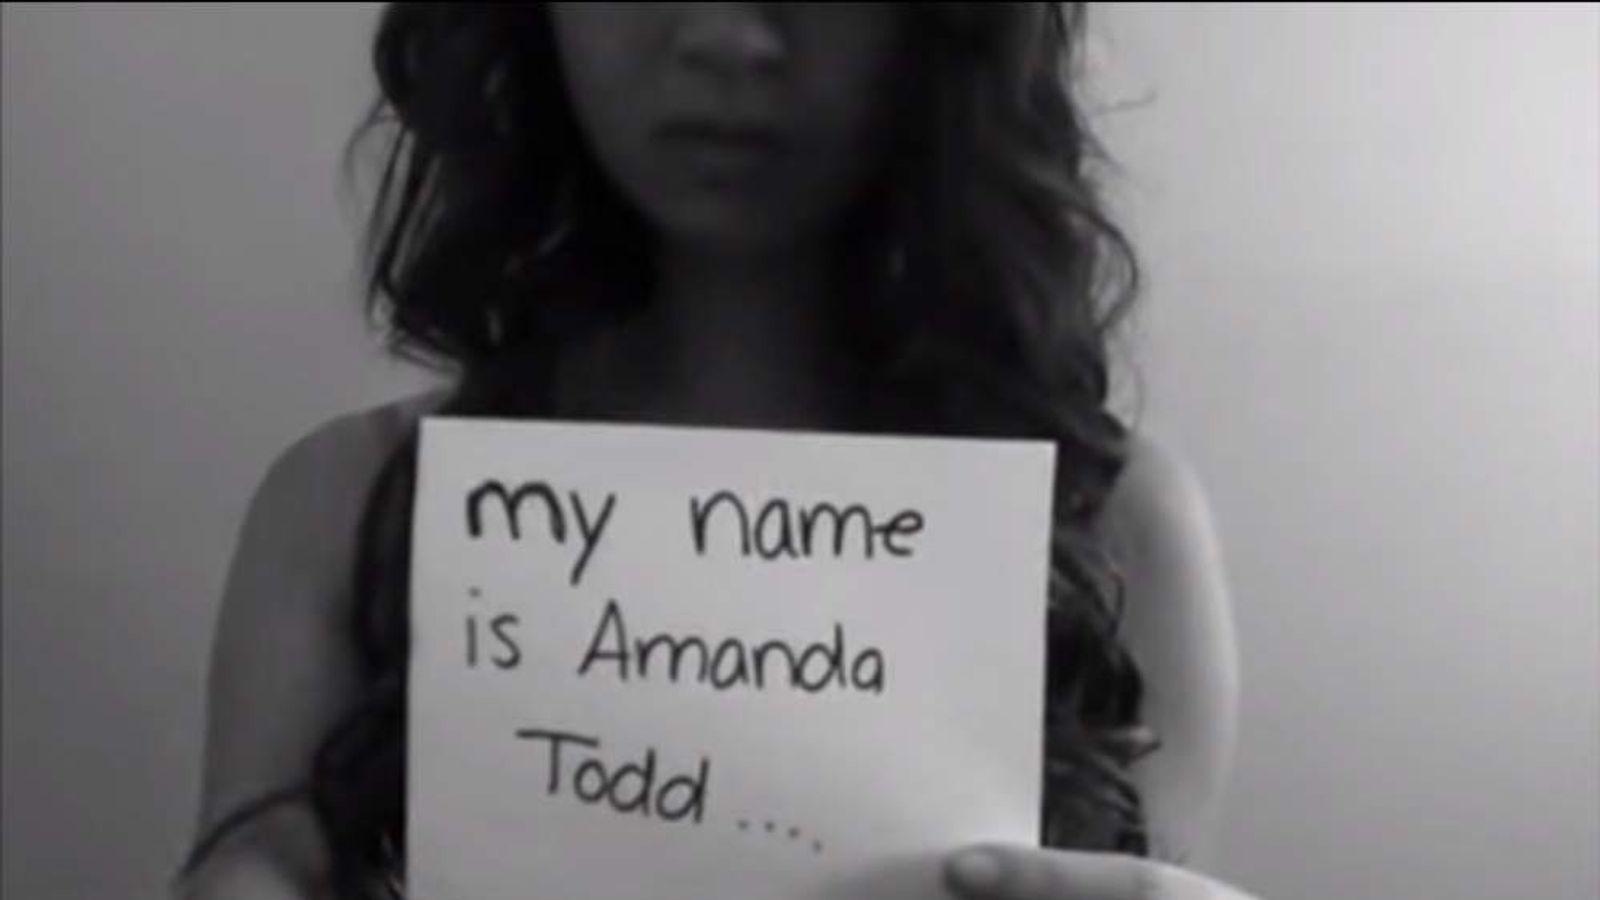 Amanda Todd Suicide Mans Arrest Linked To Case